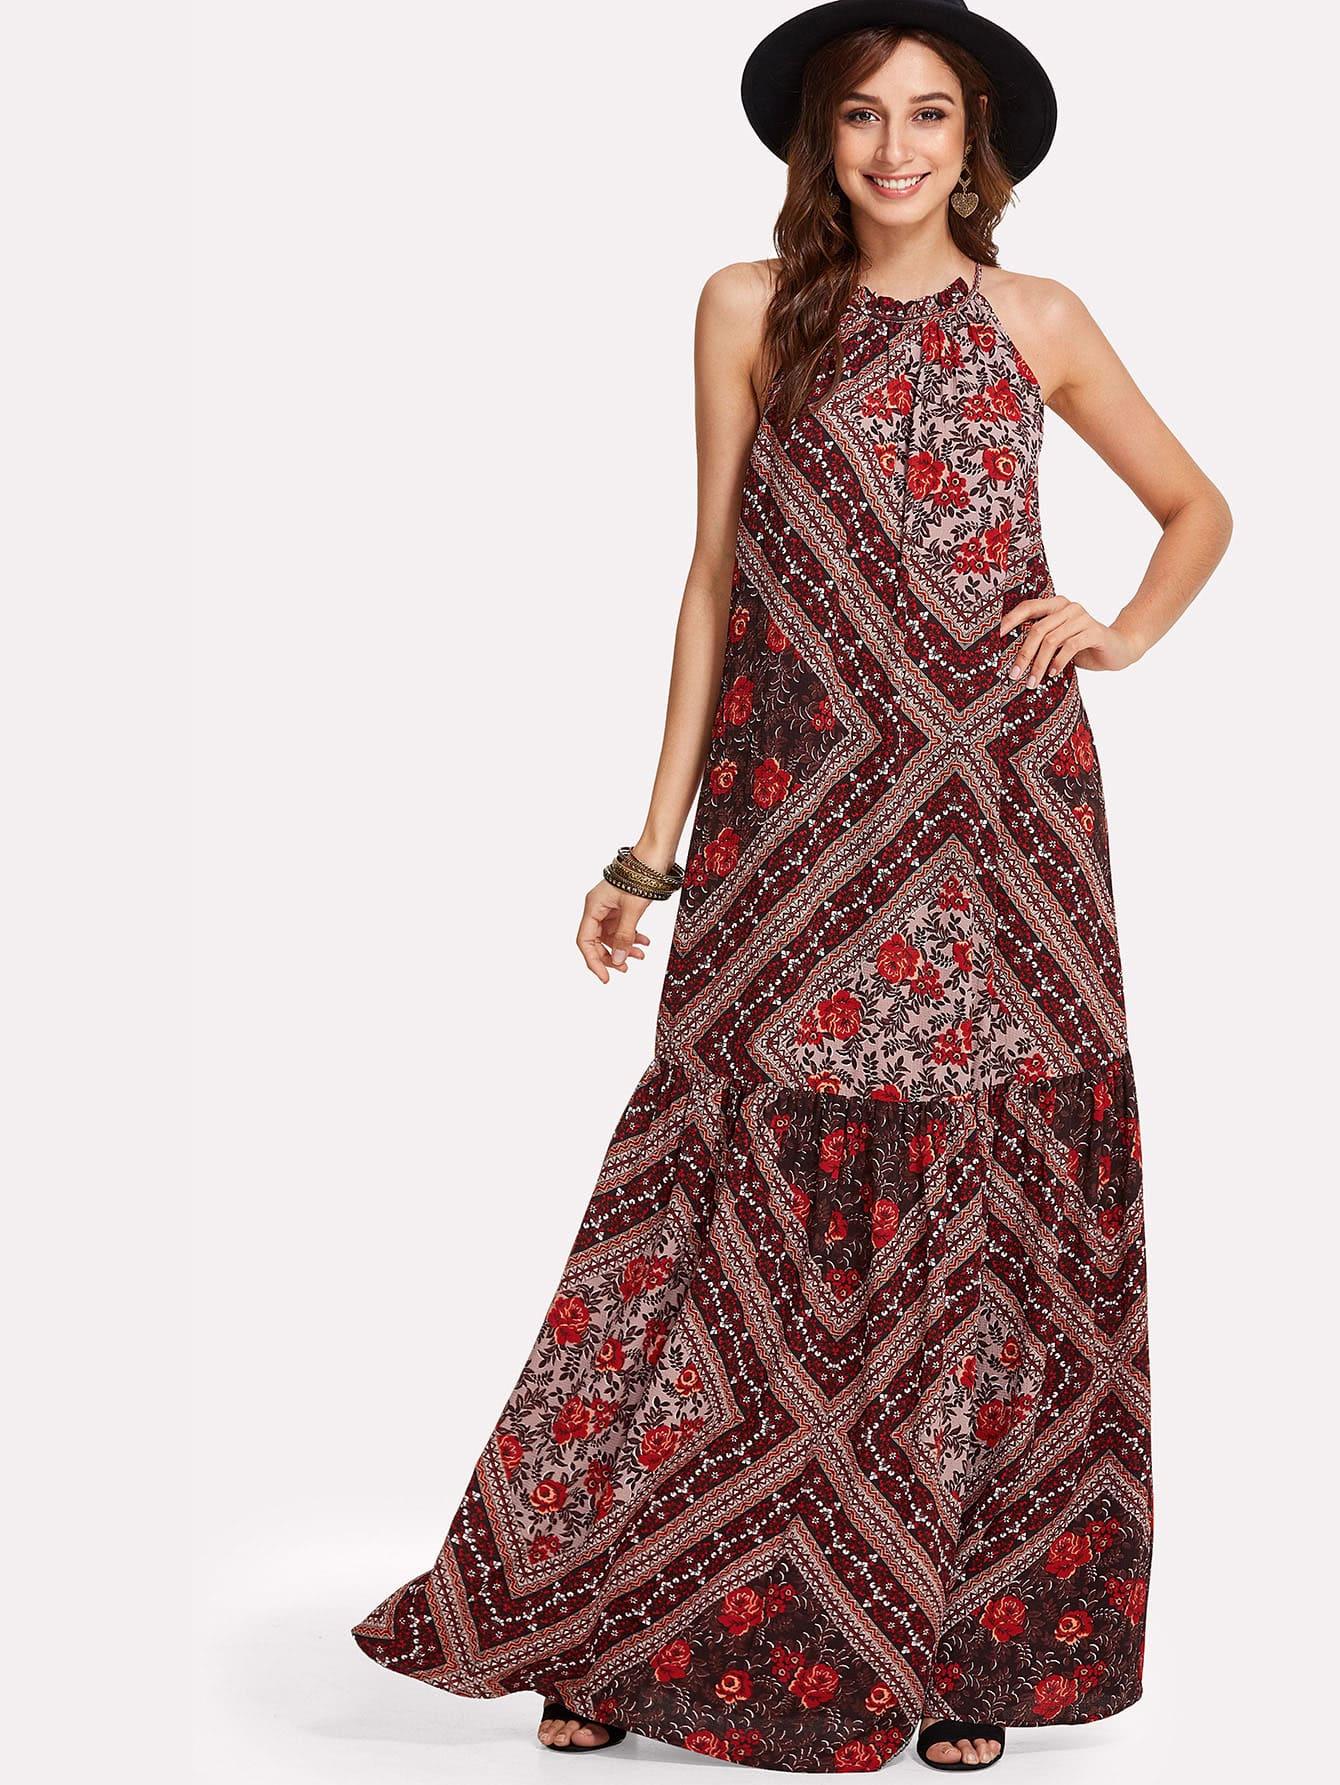 Patchwork Print Tiered Hem Halter Dress patchwork print tiered hem halter dress